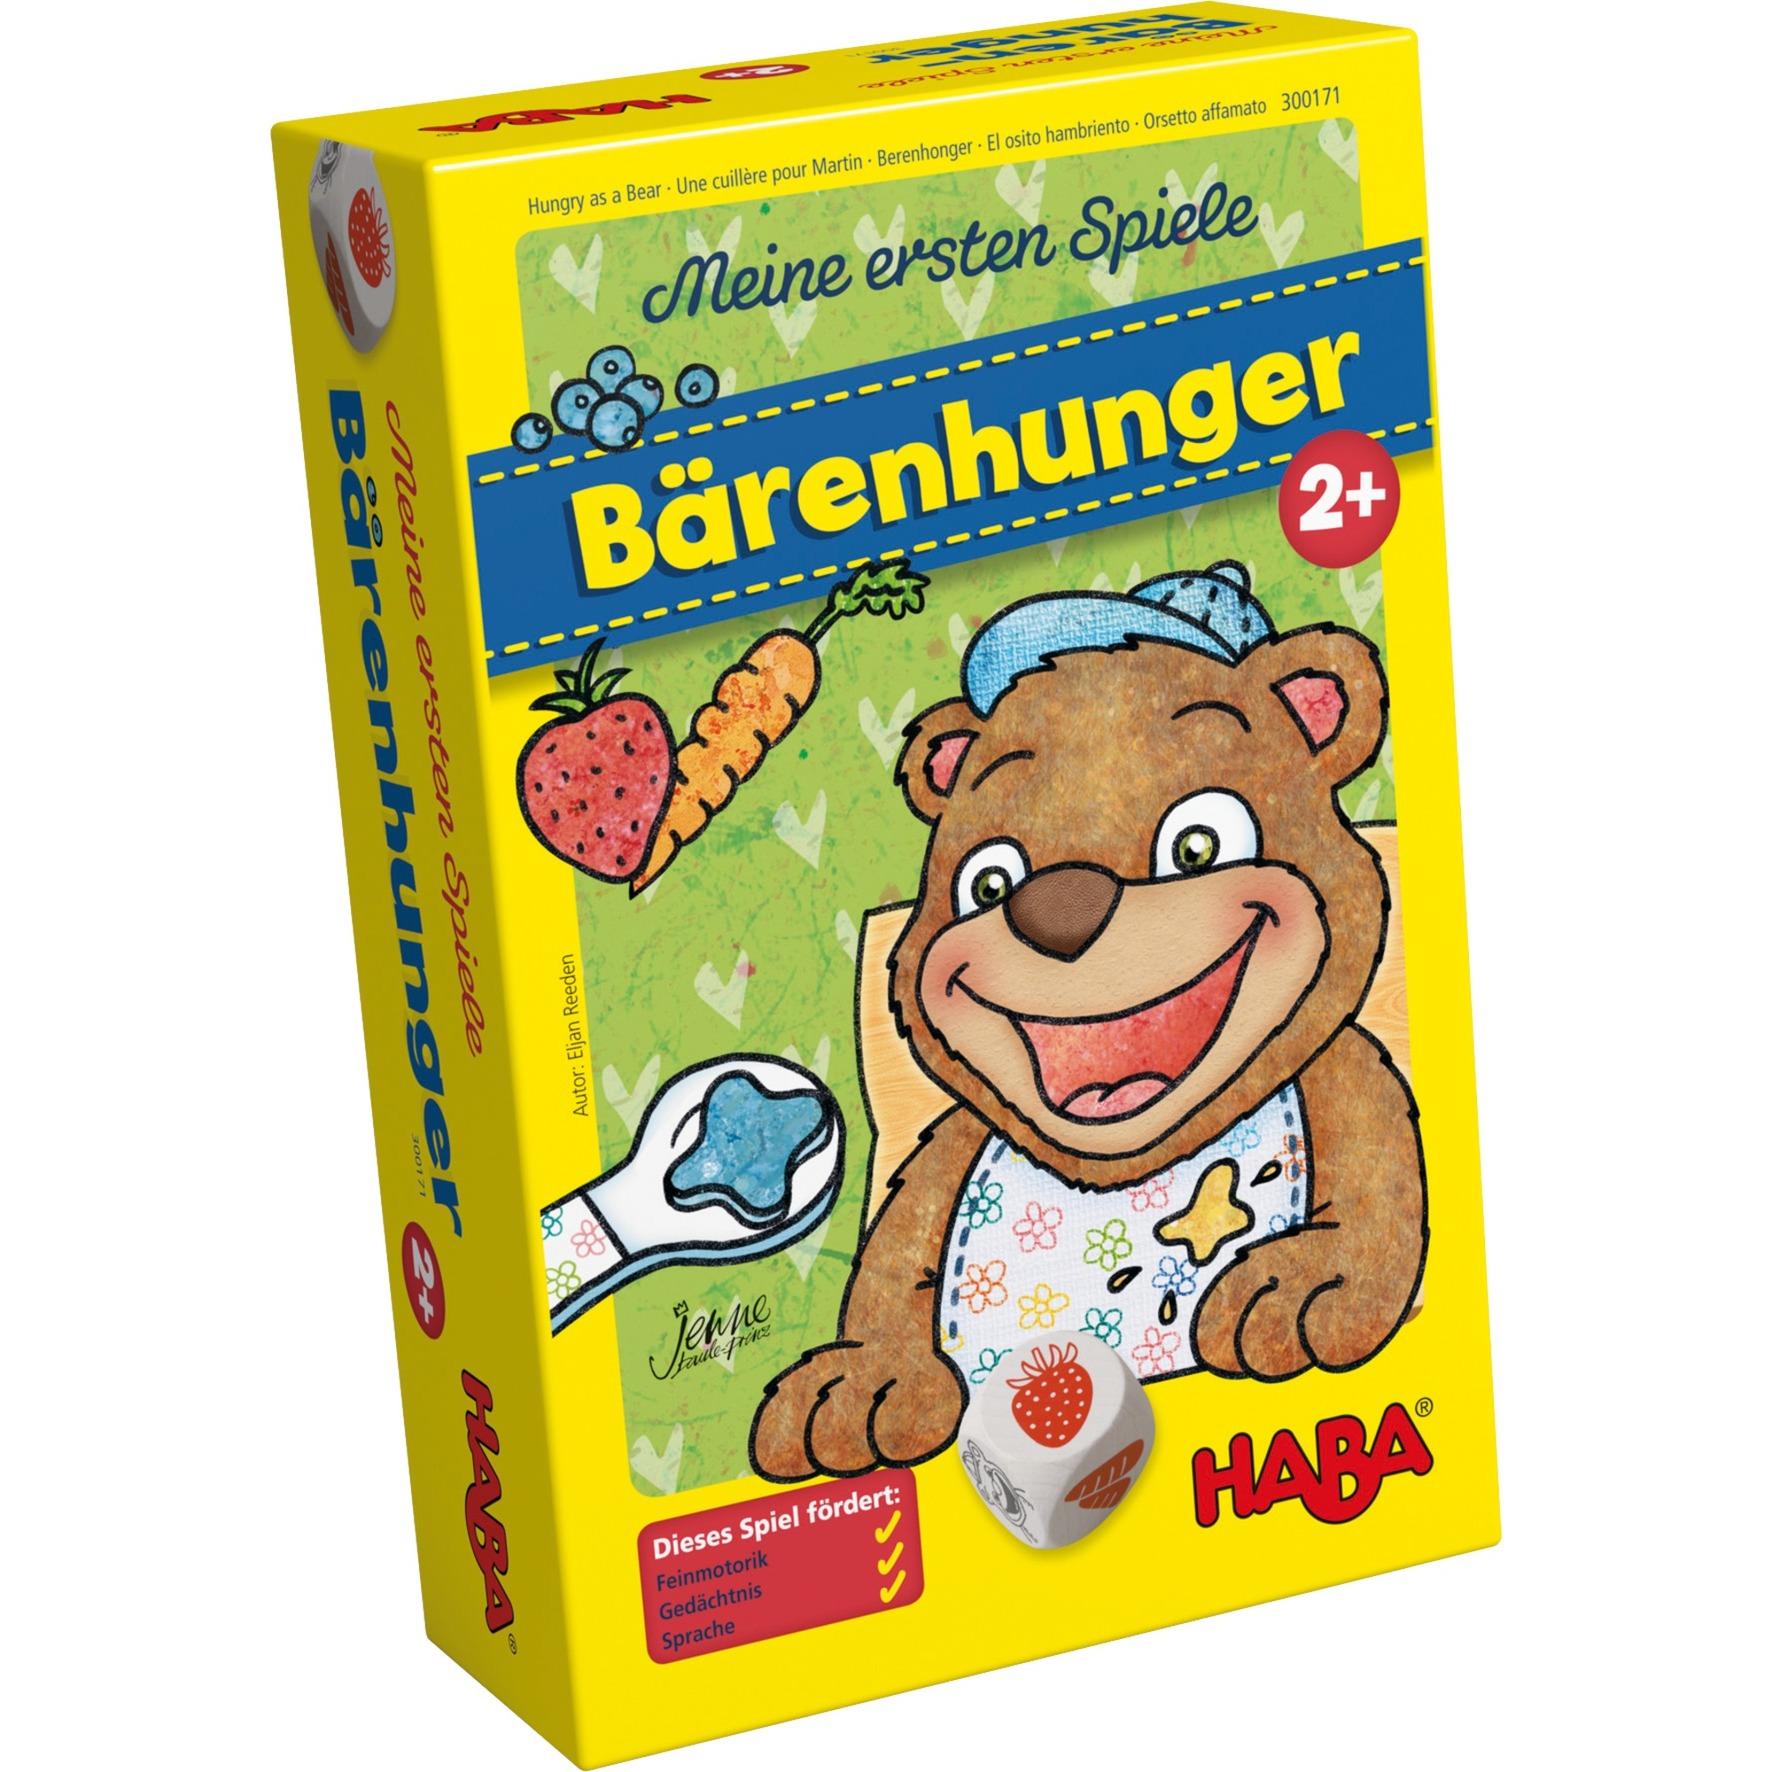 Bärenhunger, Juego de dados